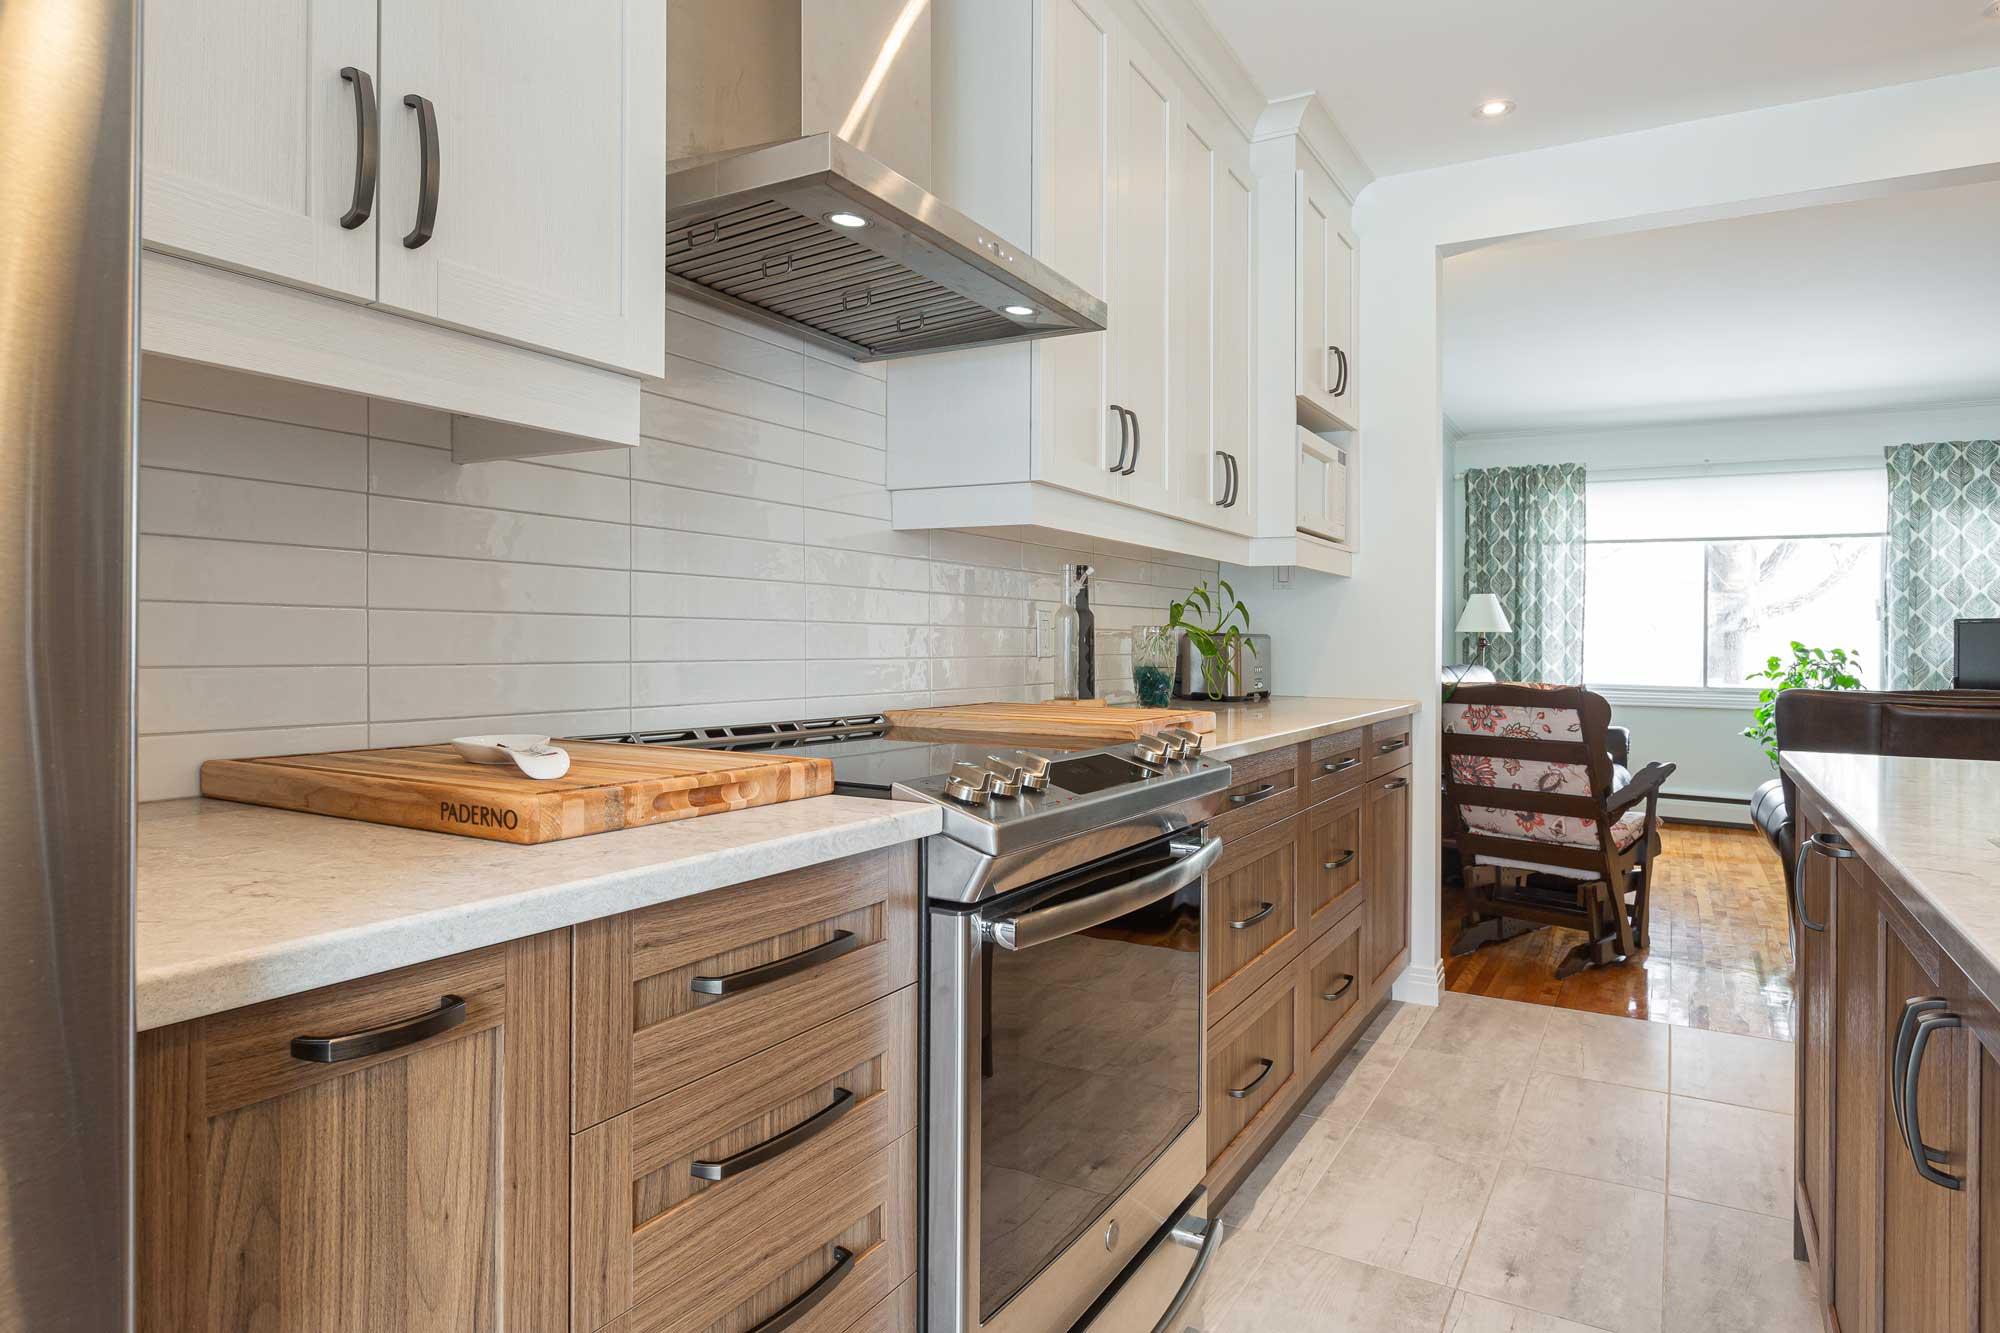 modern kitchen with two tones kitchen